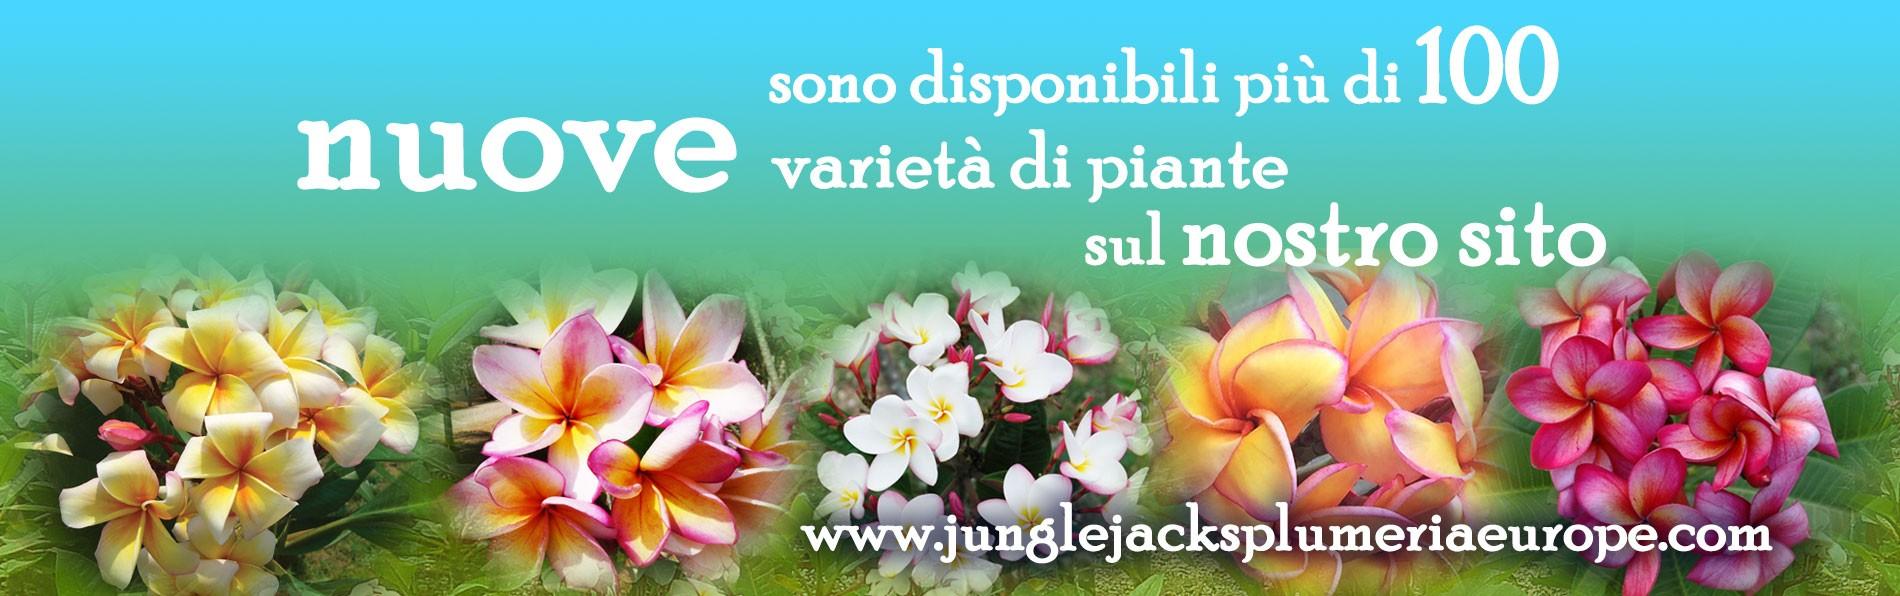 junglejacksplumeriaeurope novità 2018